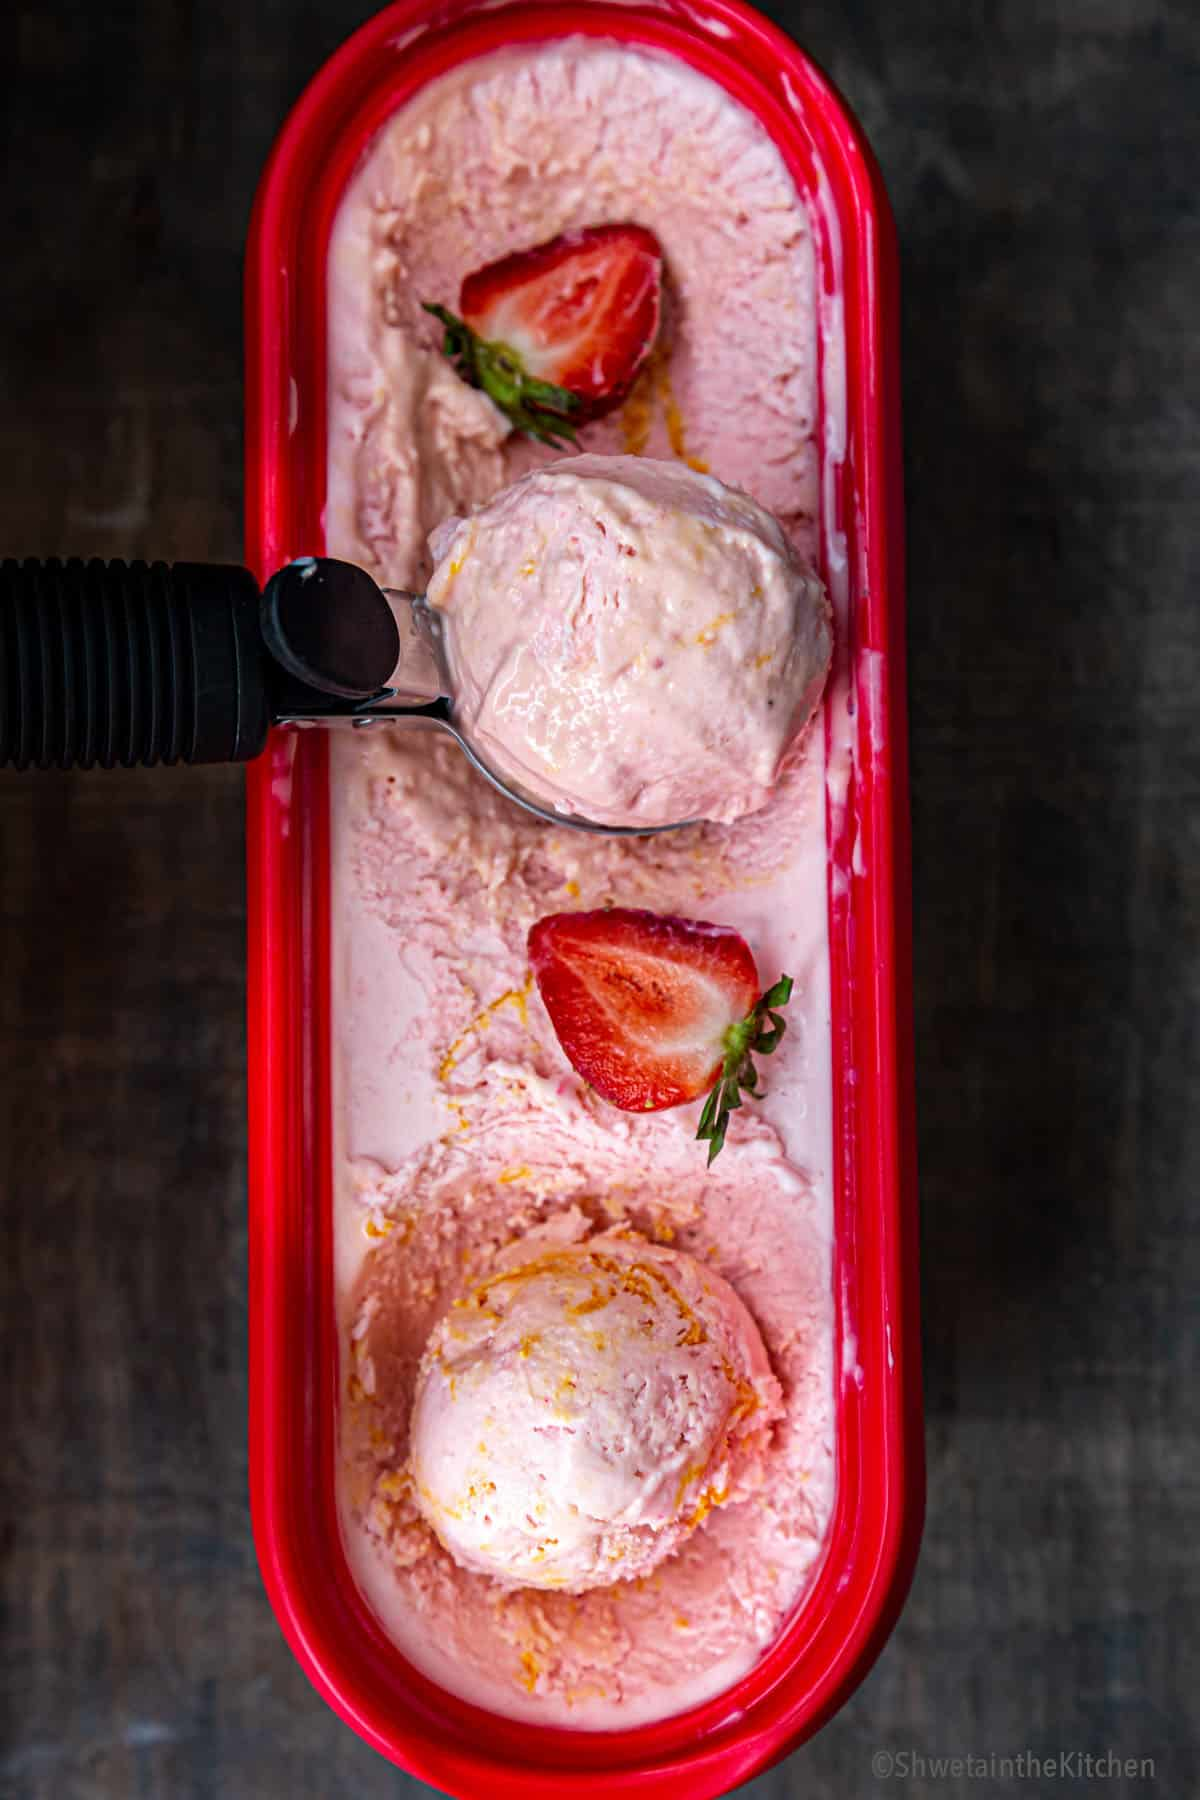 Tub of strawberry icecream with cut strawberry